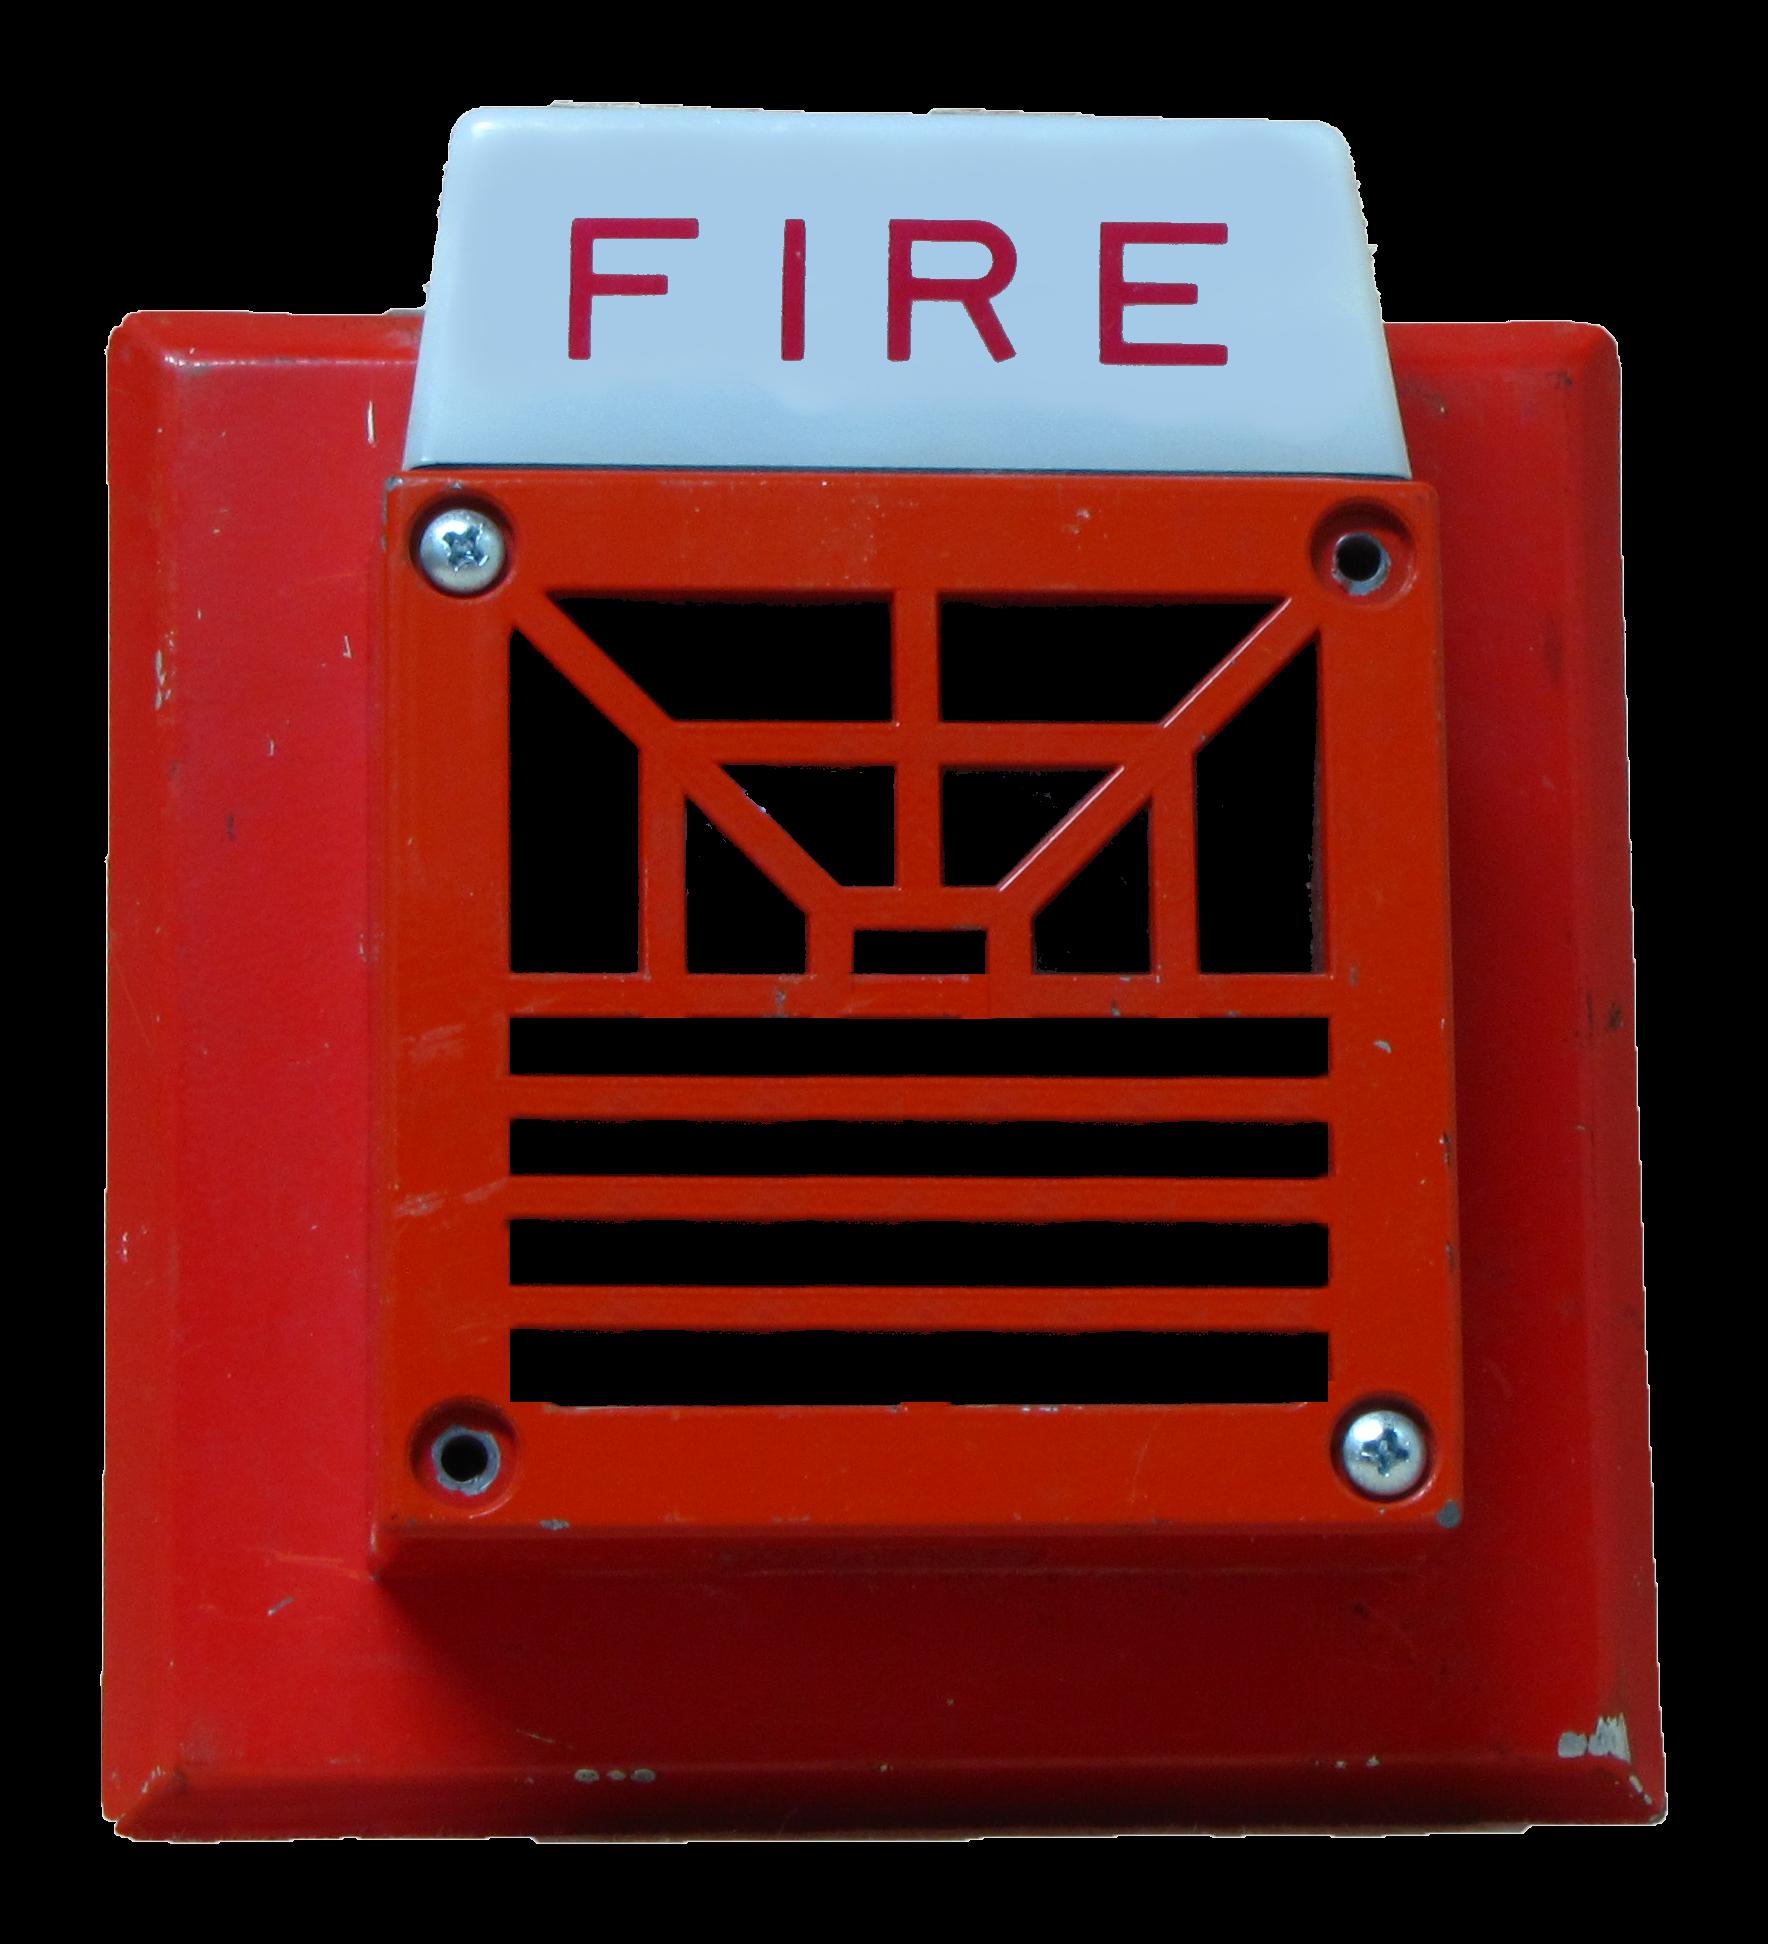 Sensor Fire Alarm Sound : Alarm system wallpapers gallery